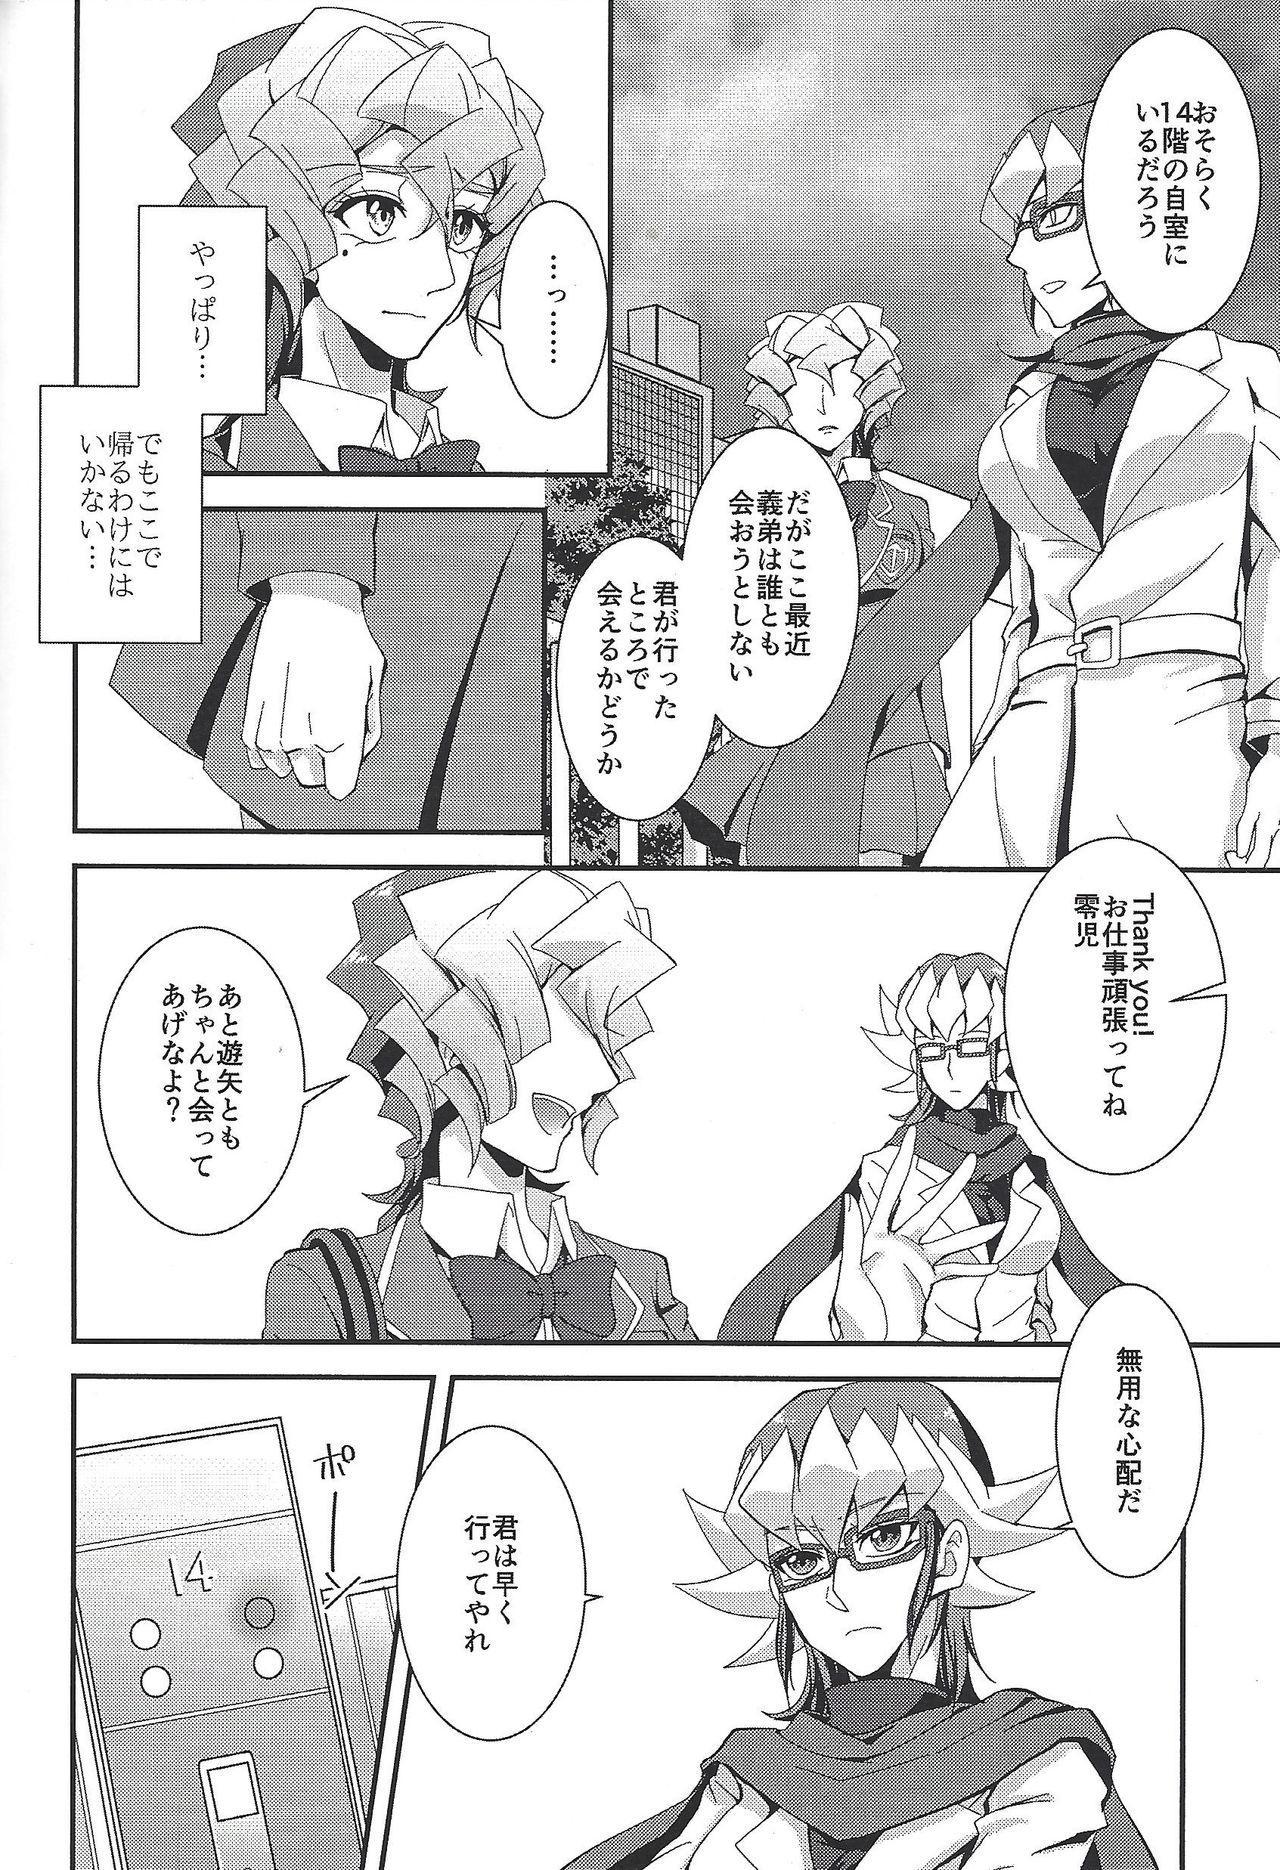 Saitei na Koi o Shiyou 38